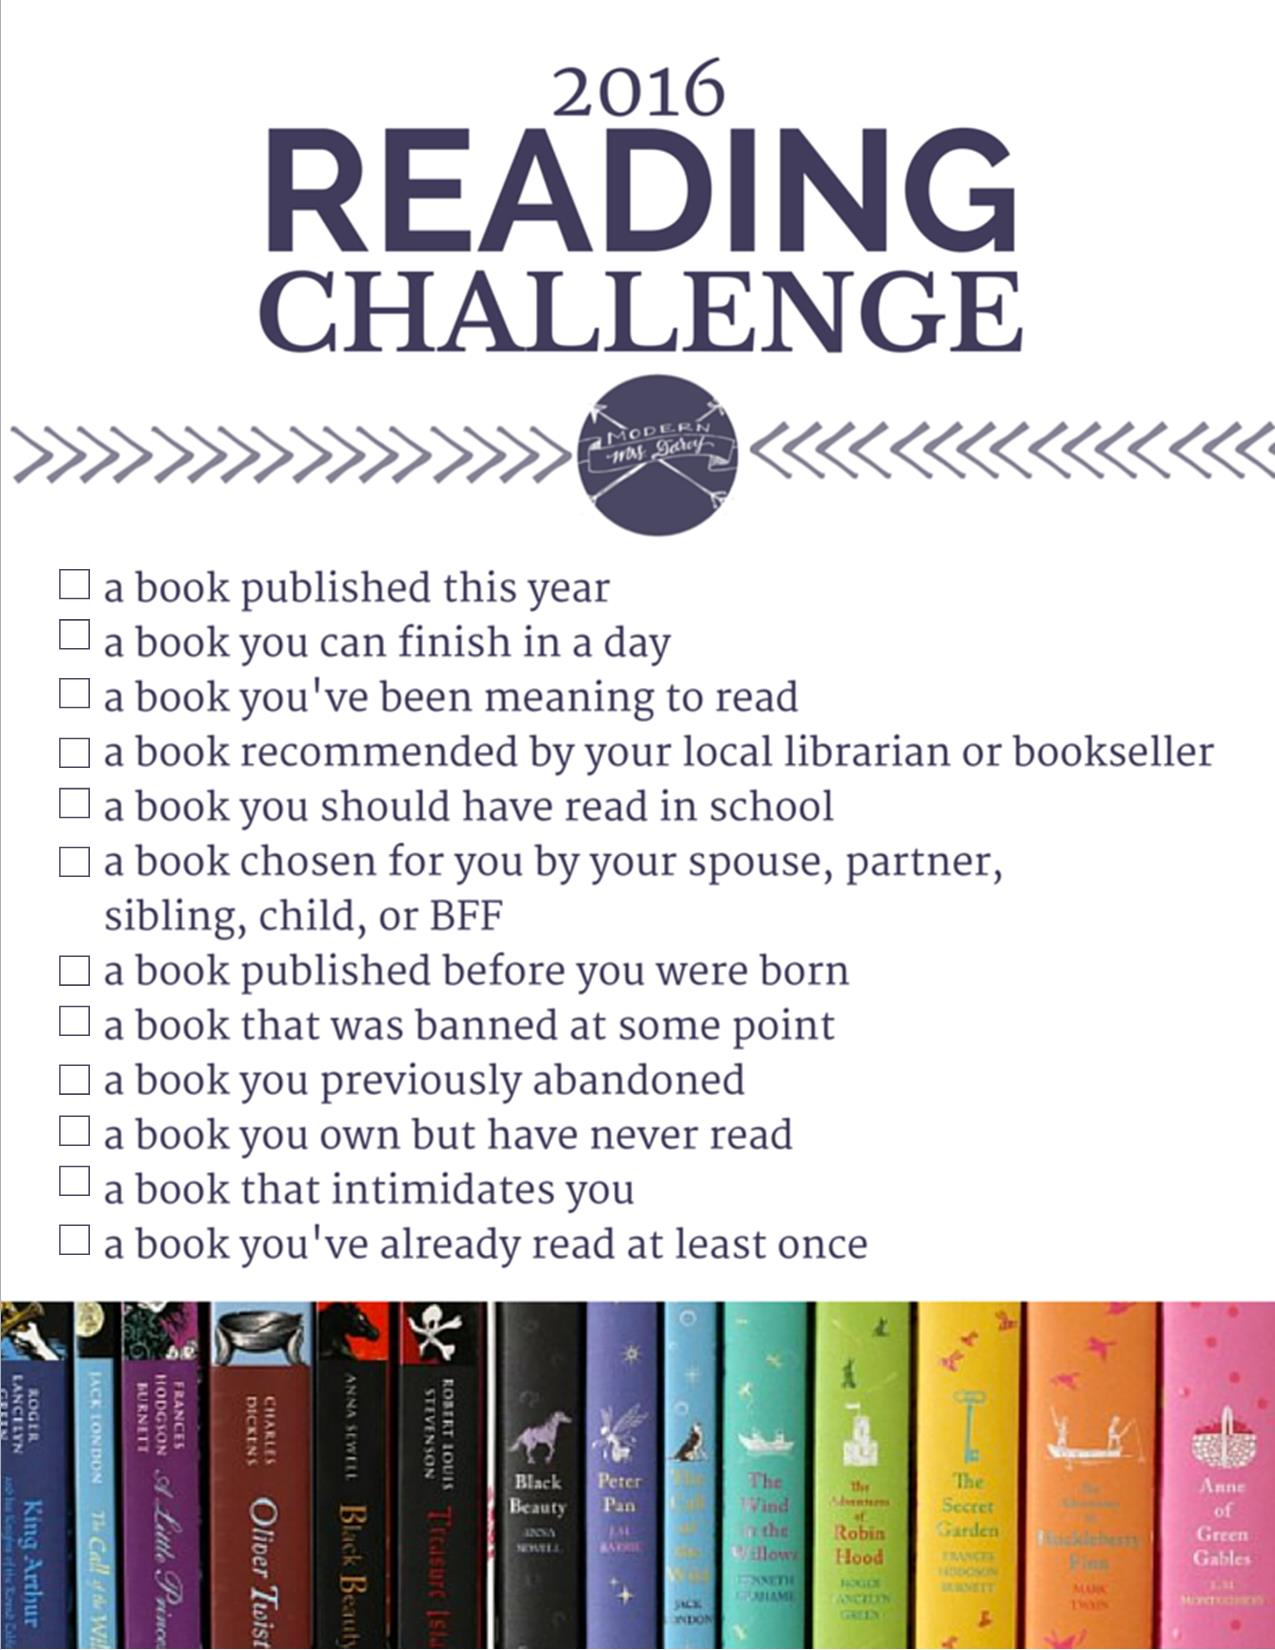 MMD-2016-Reading-Challenge.jpg